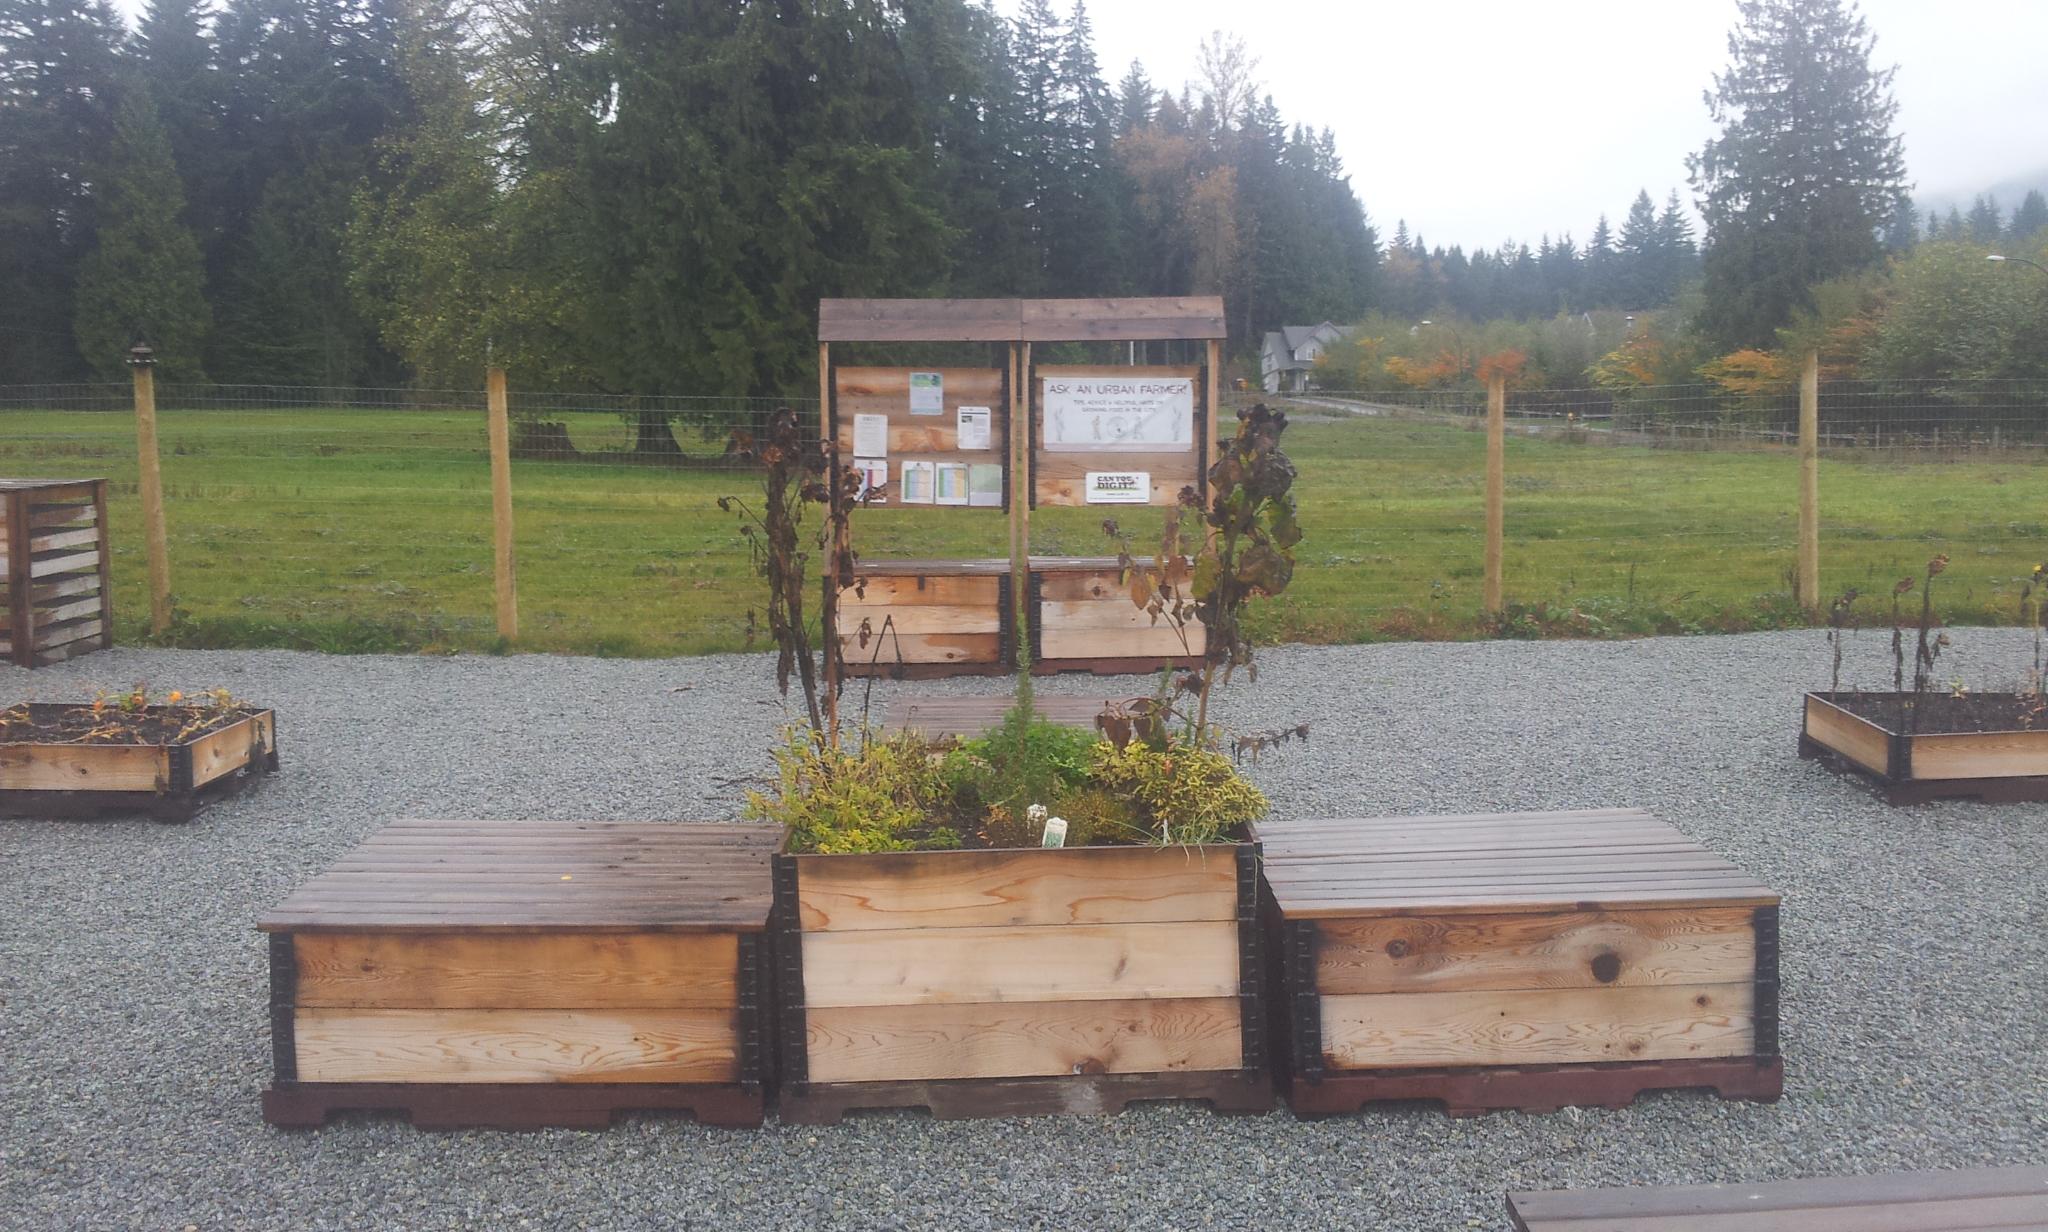 burke-mountain-temporary-community-garden-closing-112013_11244613884_o.jpg